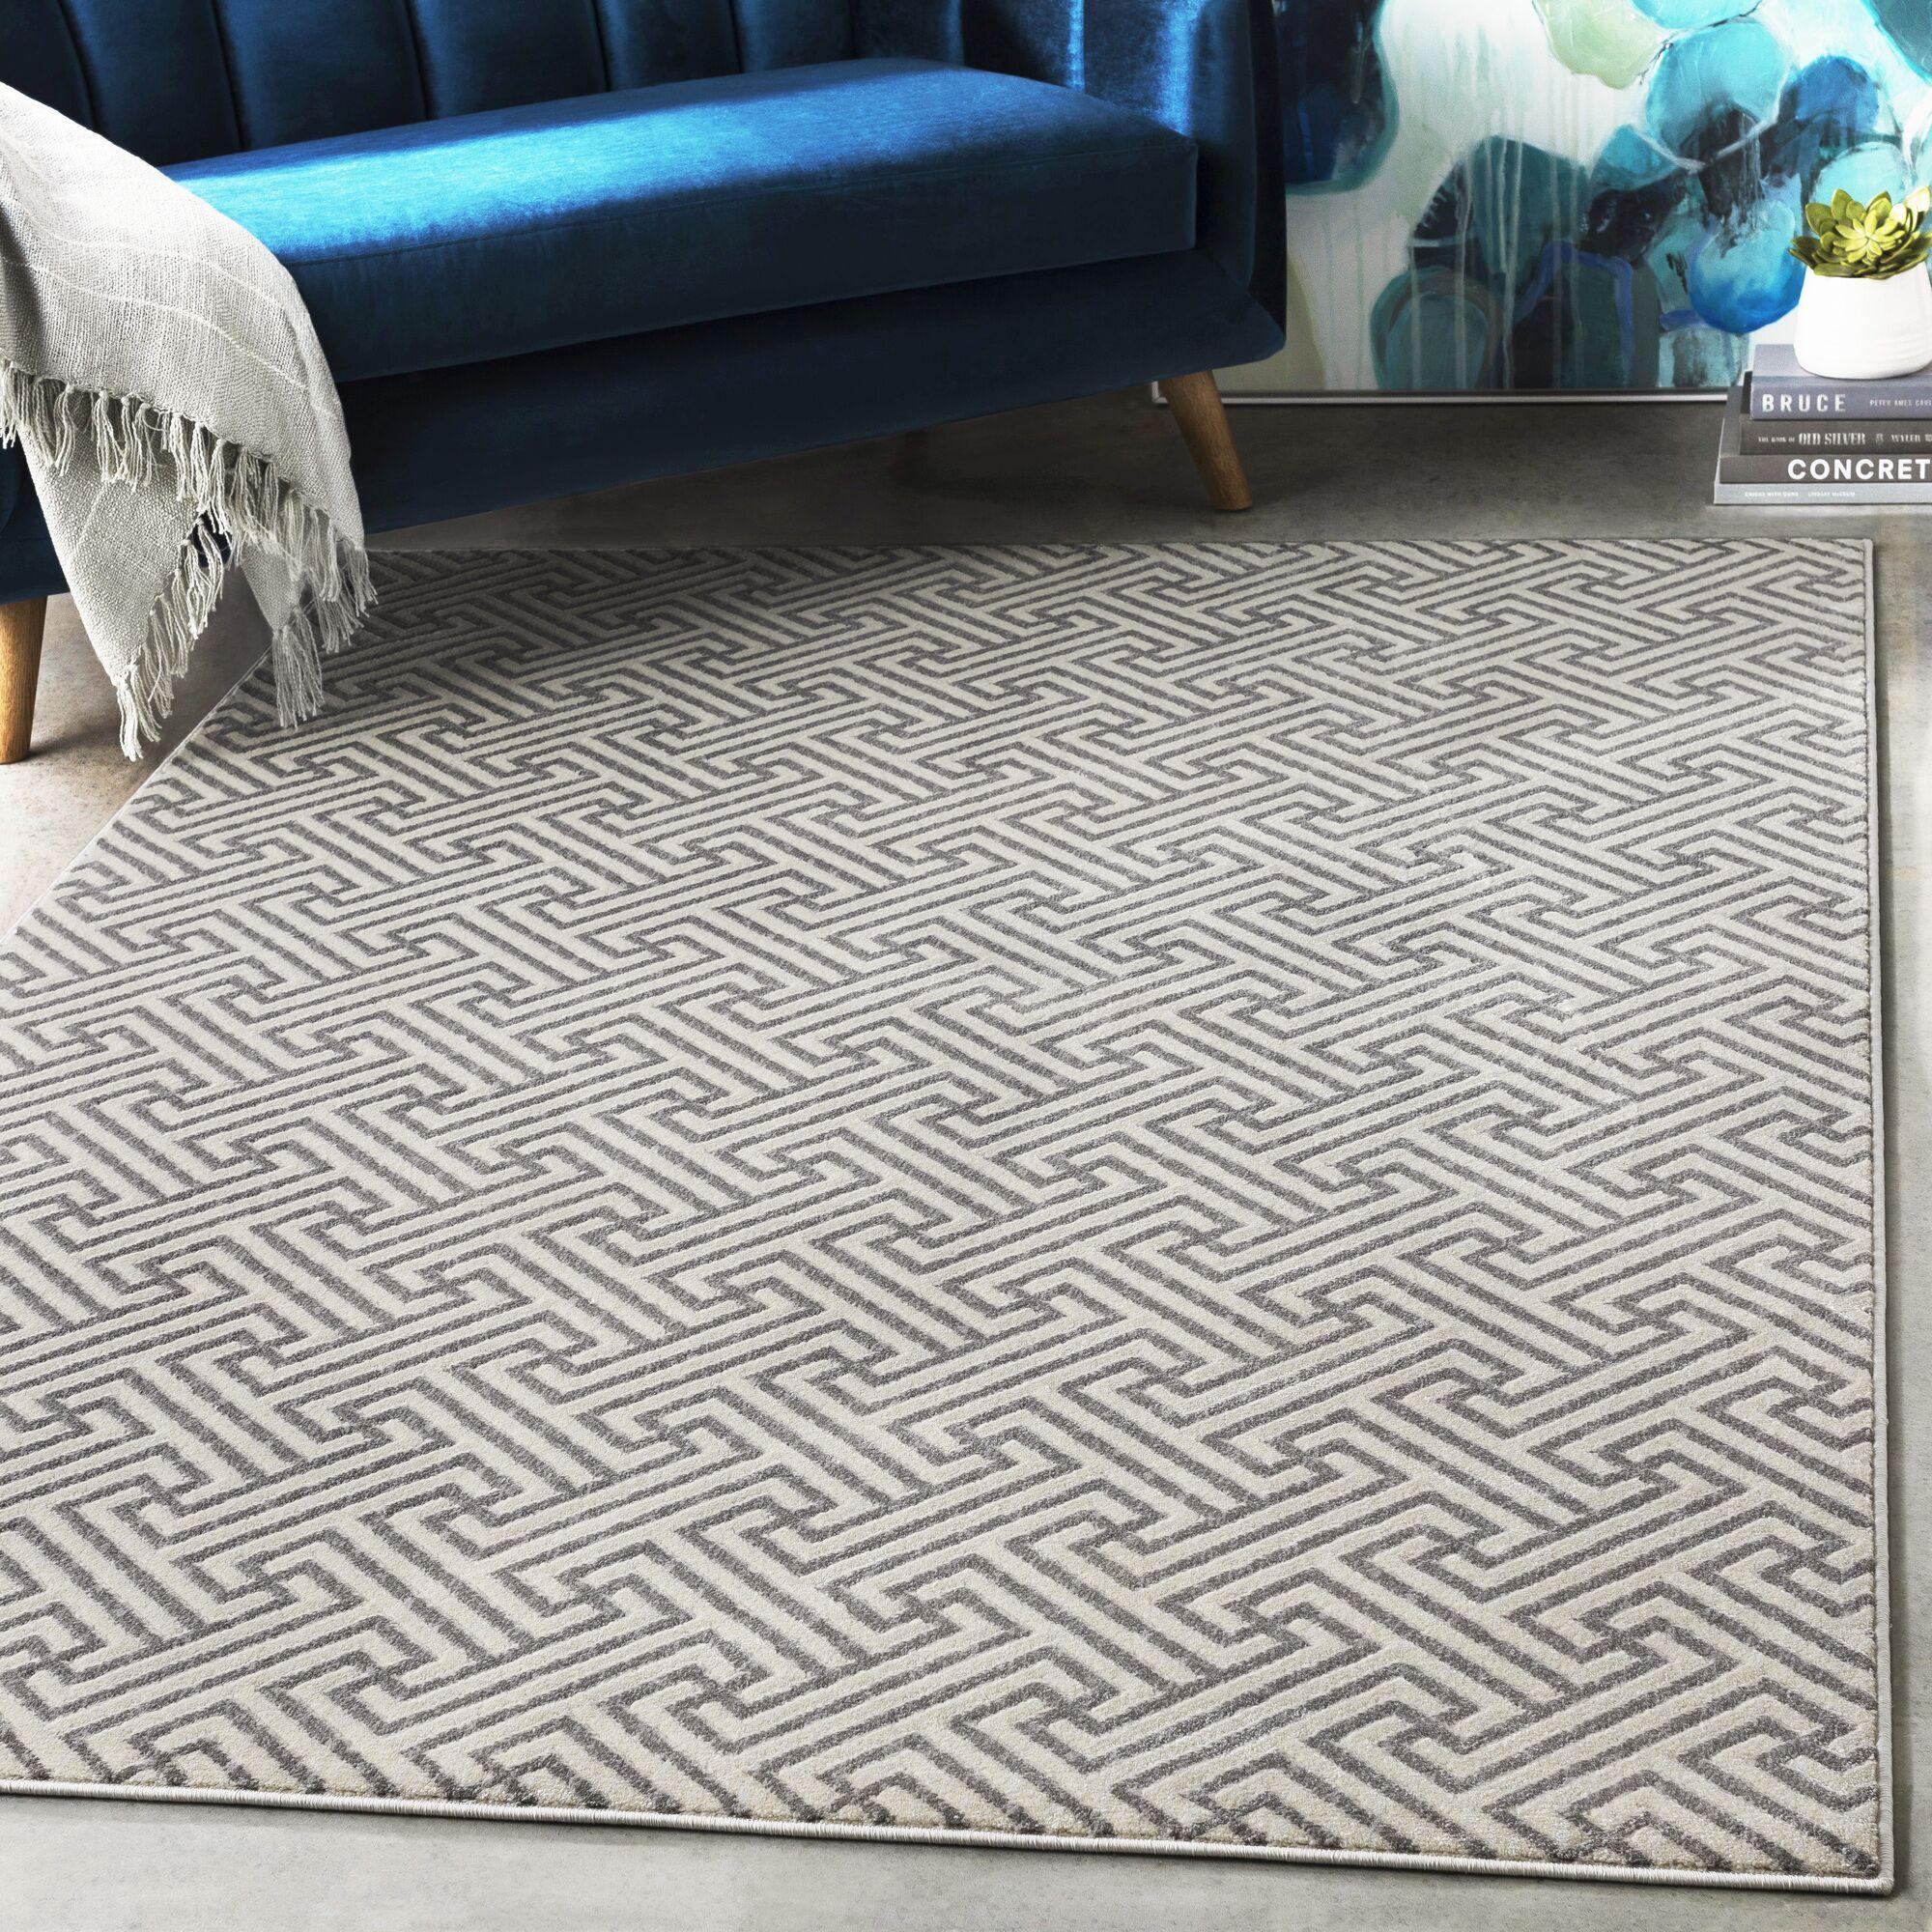 Hyacinth Modern Geometric Charcoal/Gray Area Rug Rug Size: Rectangle 3'11